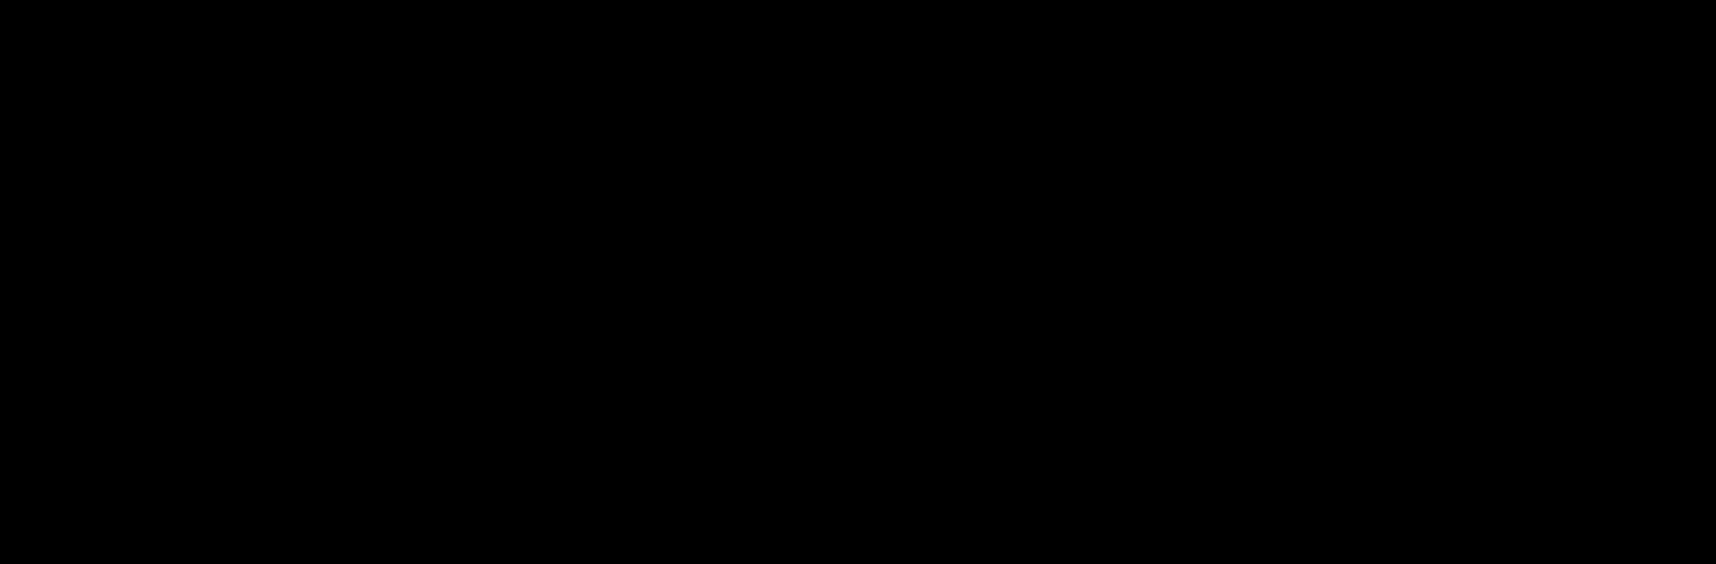 4-Methoxy-d<sub>3</sub>-3-propargyloxycinnamoyl anthranilate